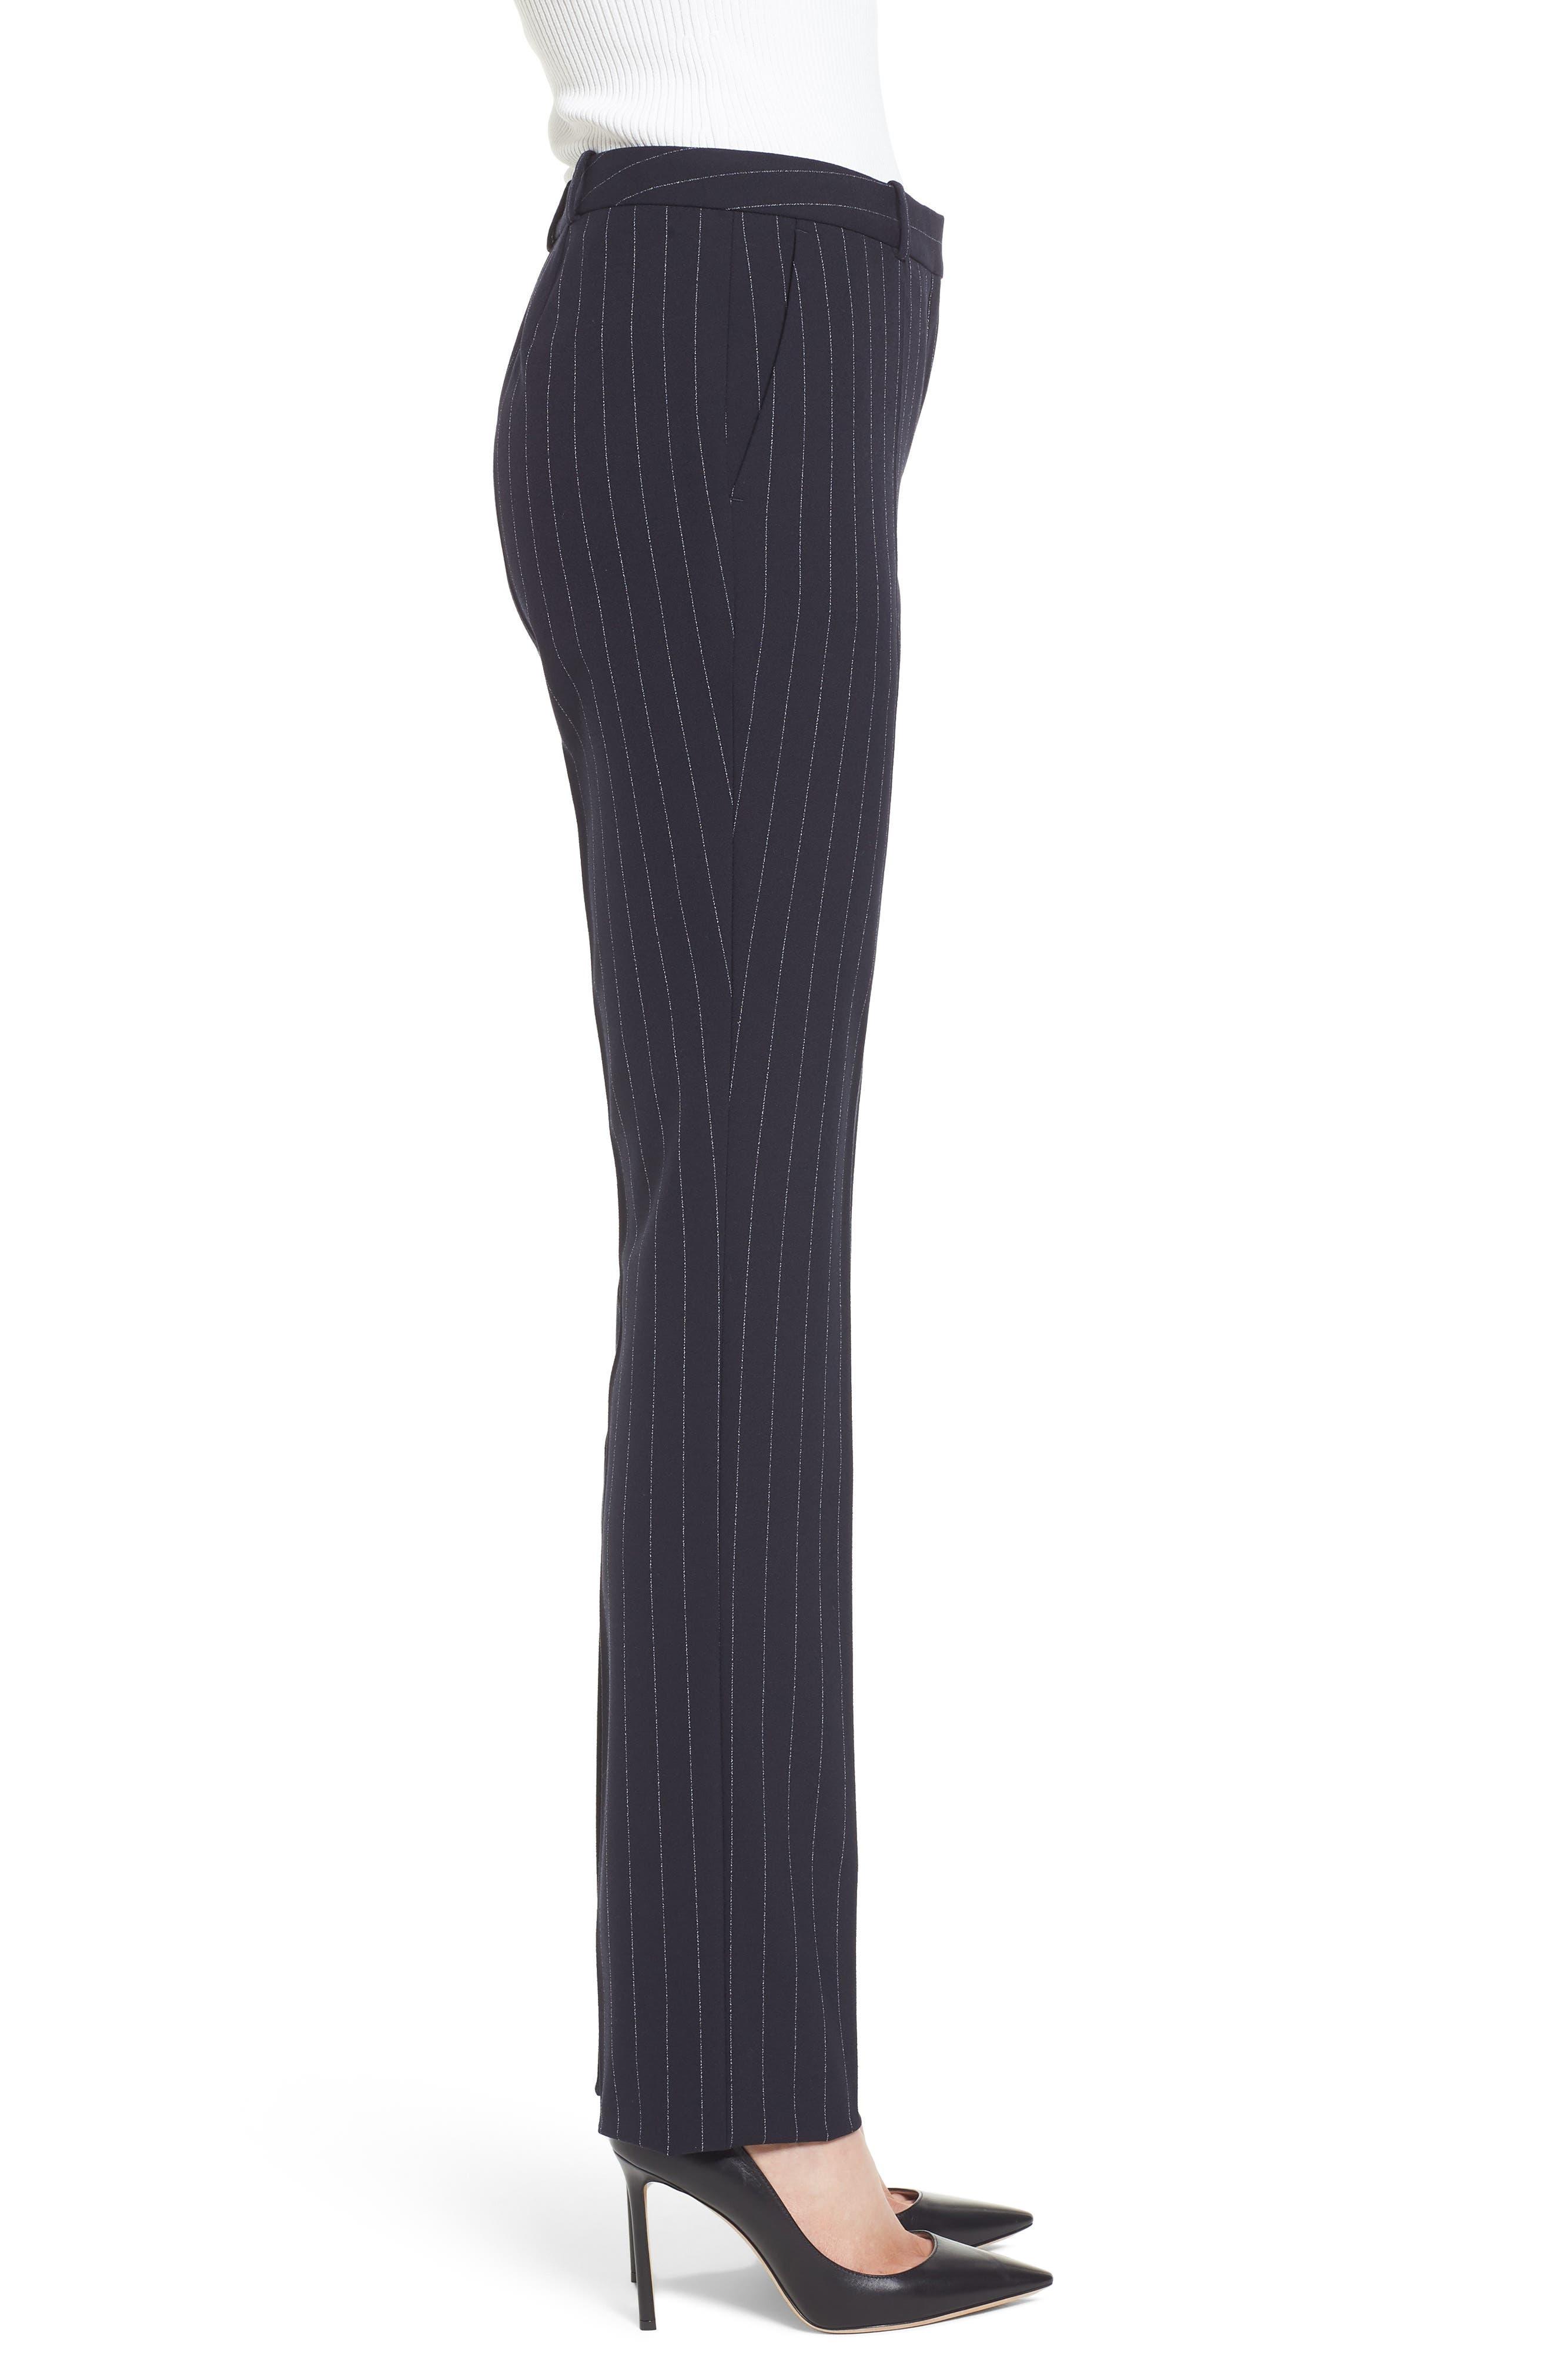 Titana Pinstripe Suit Trousers,                             Alternate thumbnail 3, color,                             461